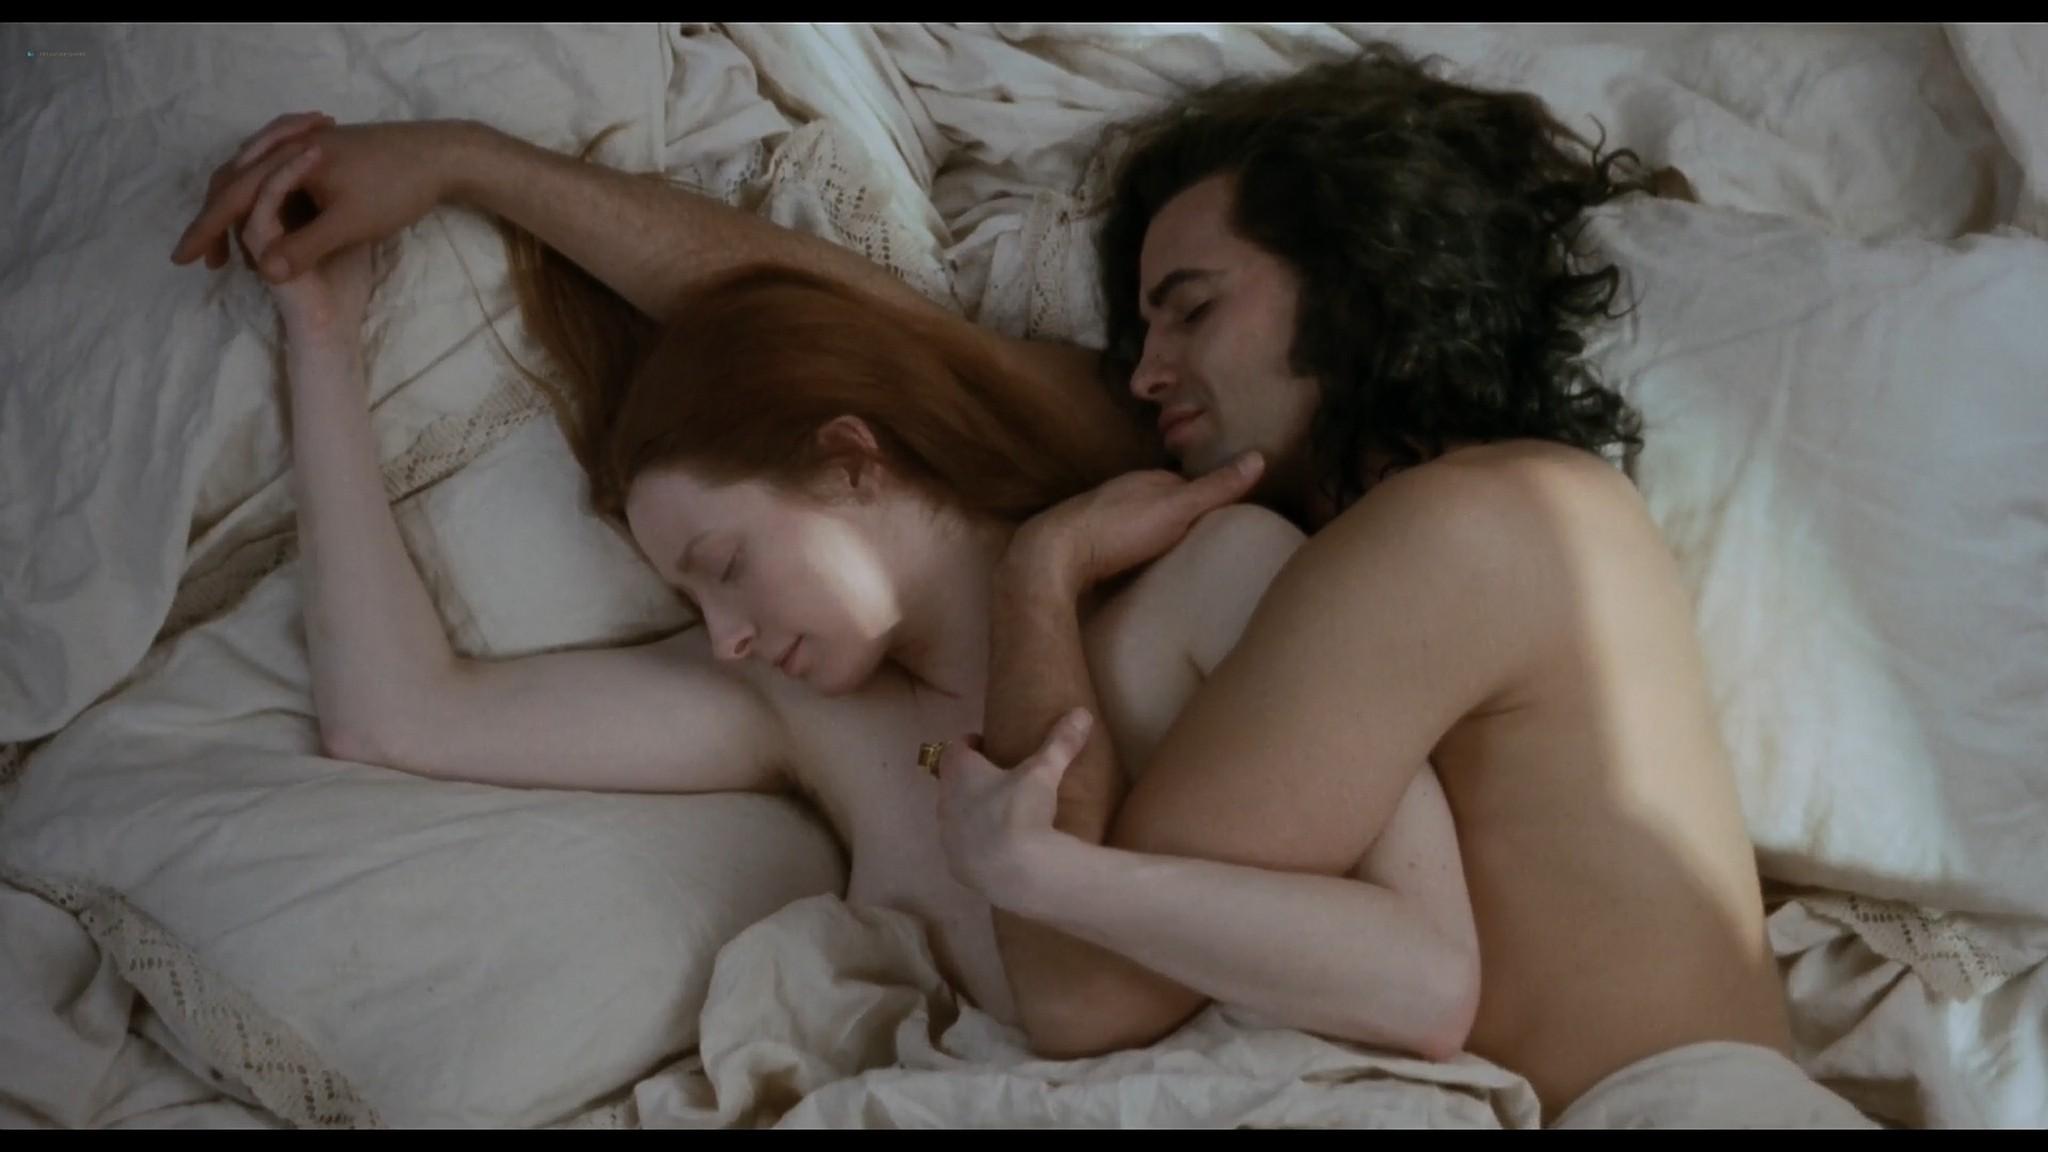 Tilda Swinton naked full frontal nude Orlando 1992 HD 1080p BluRay 9